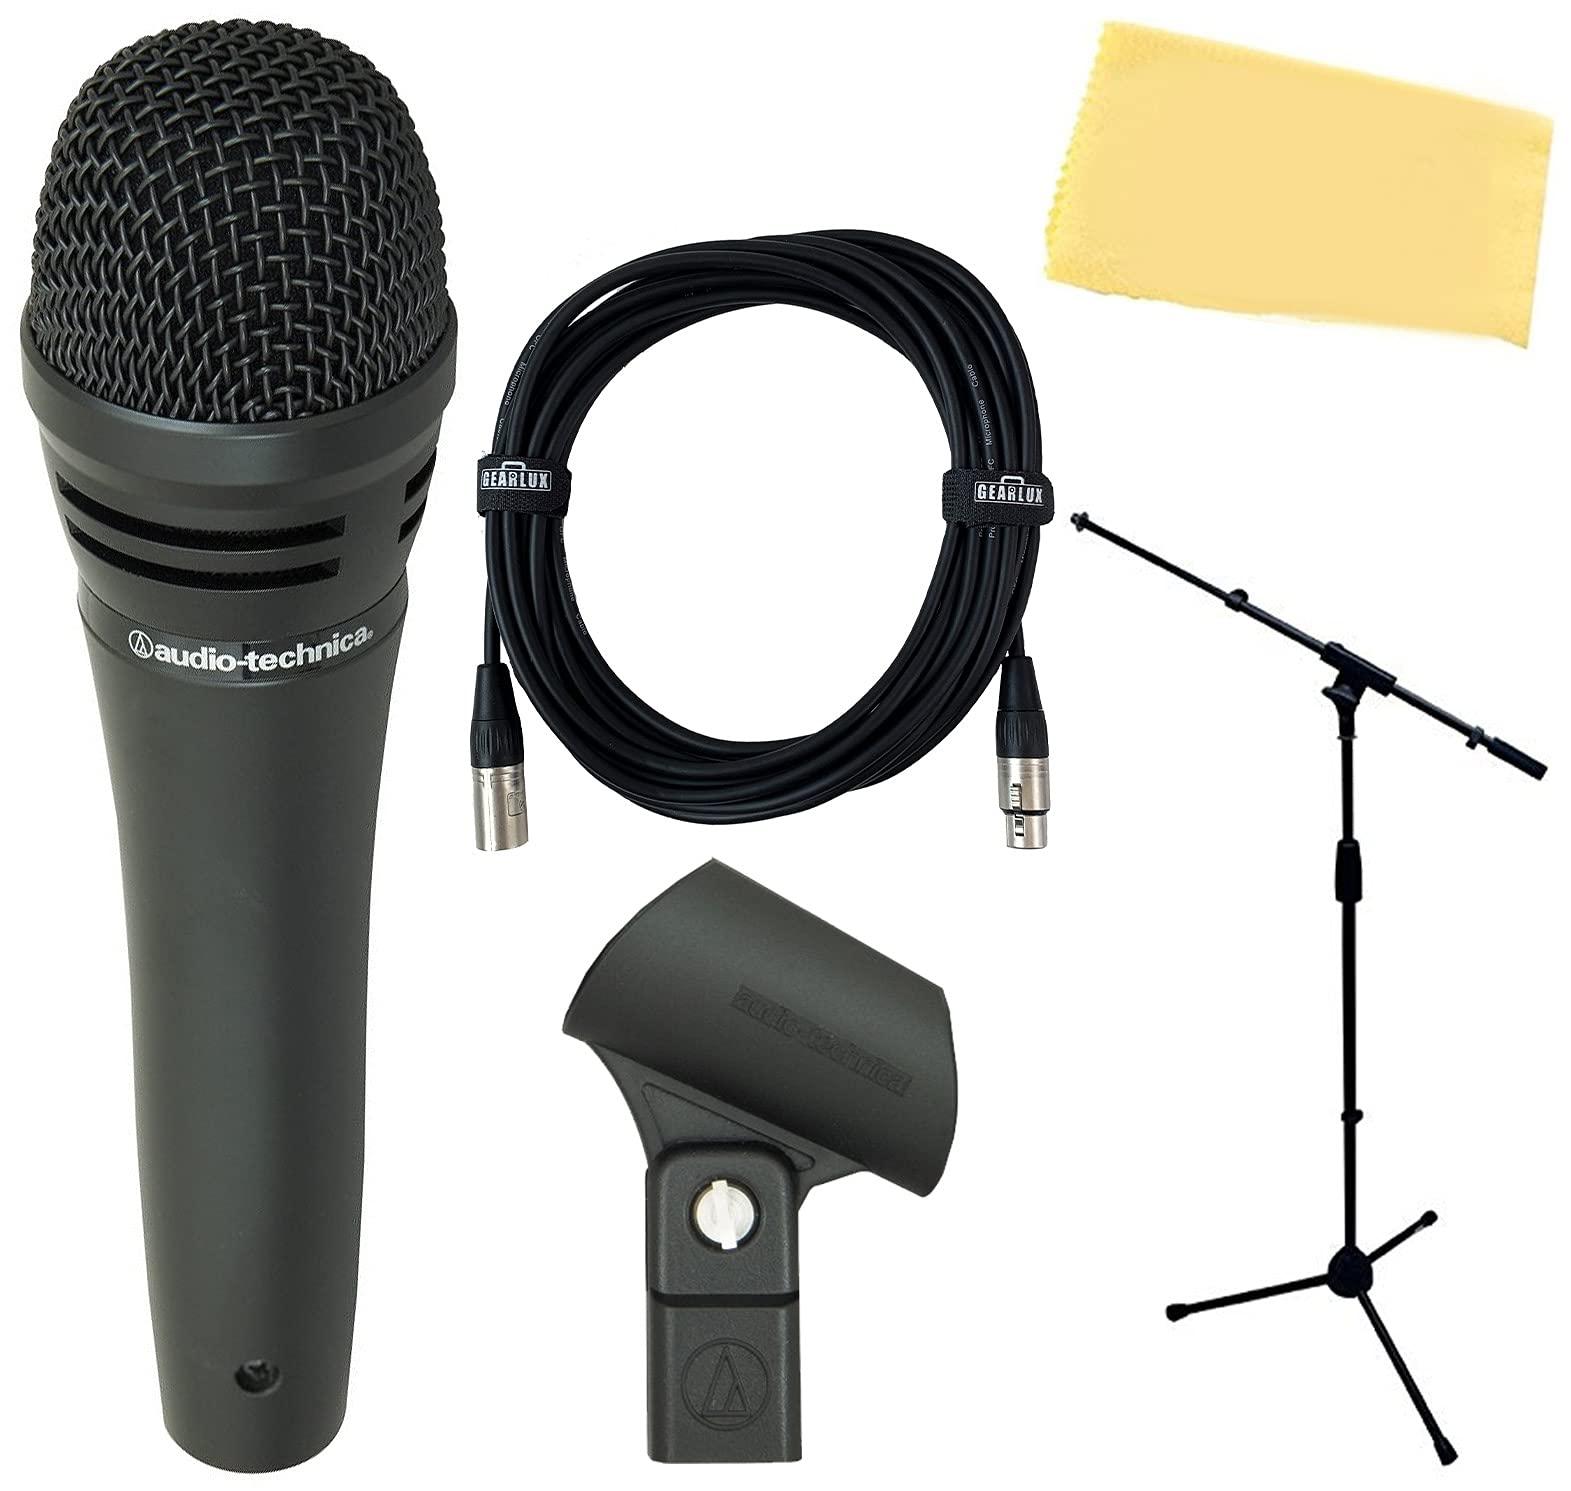 Microfono Audio-Technica M8000 Dynamic Bundle with Gearlux M